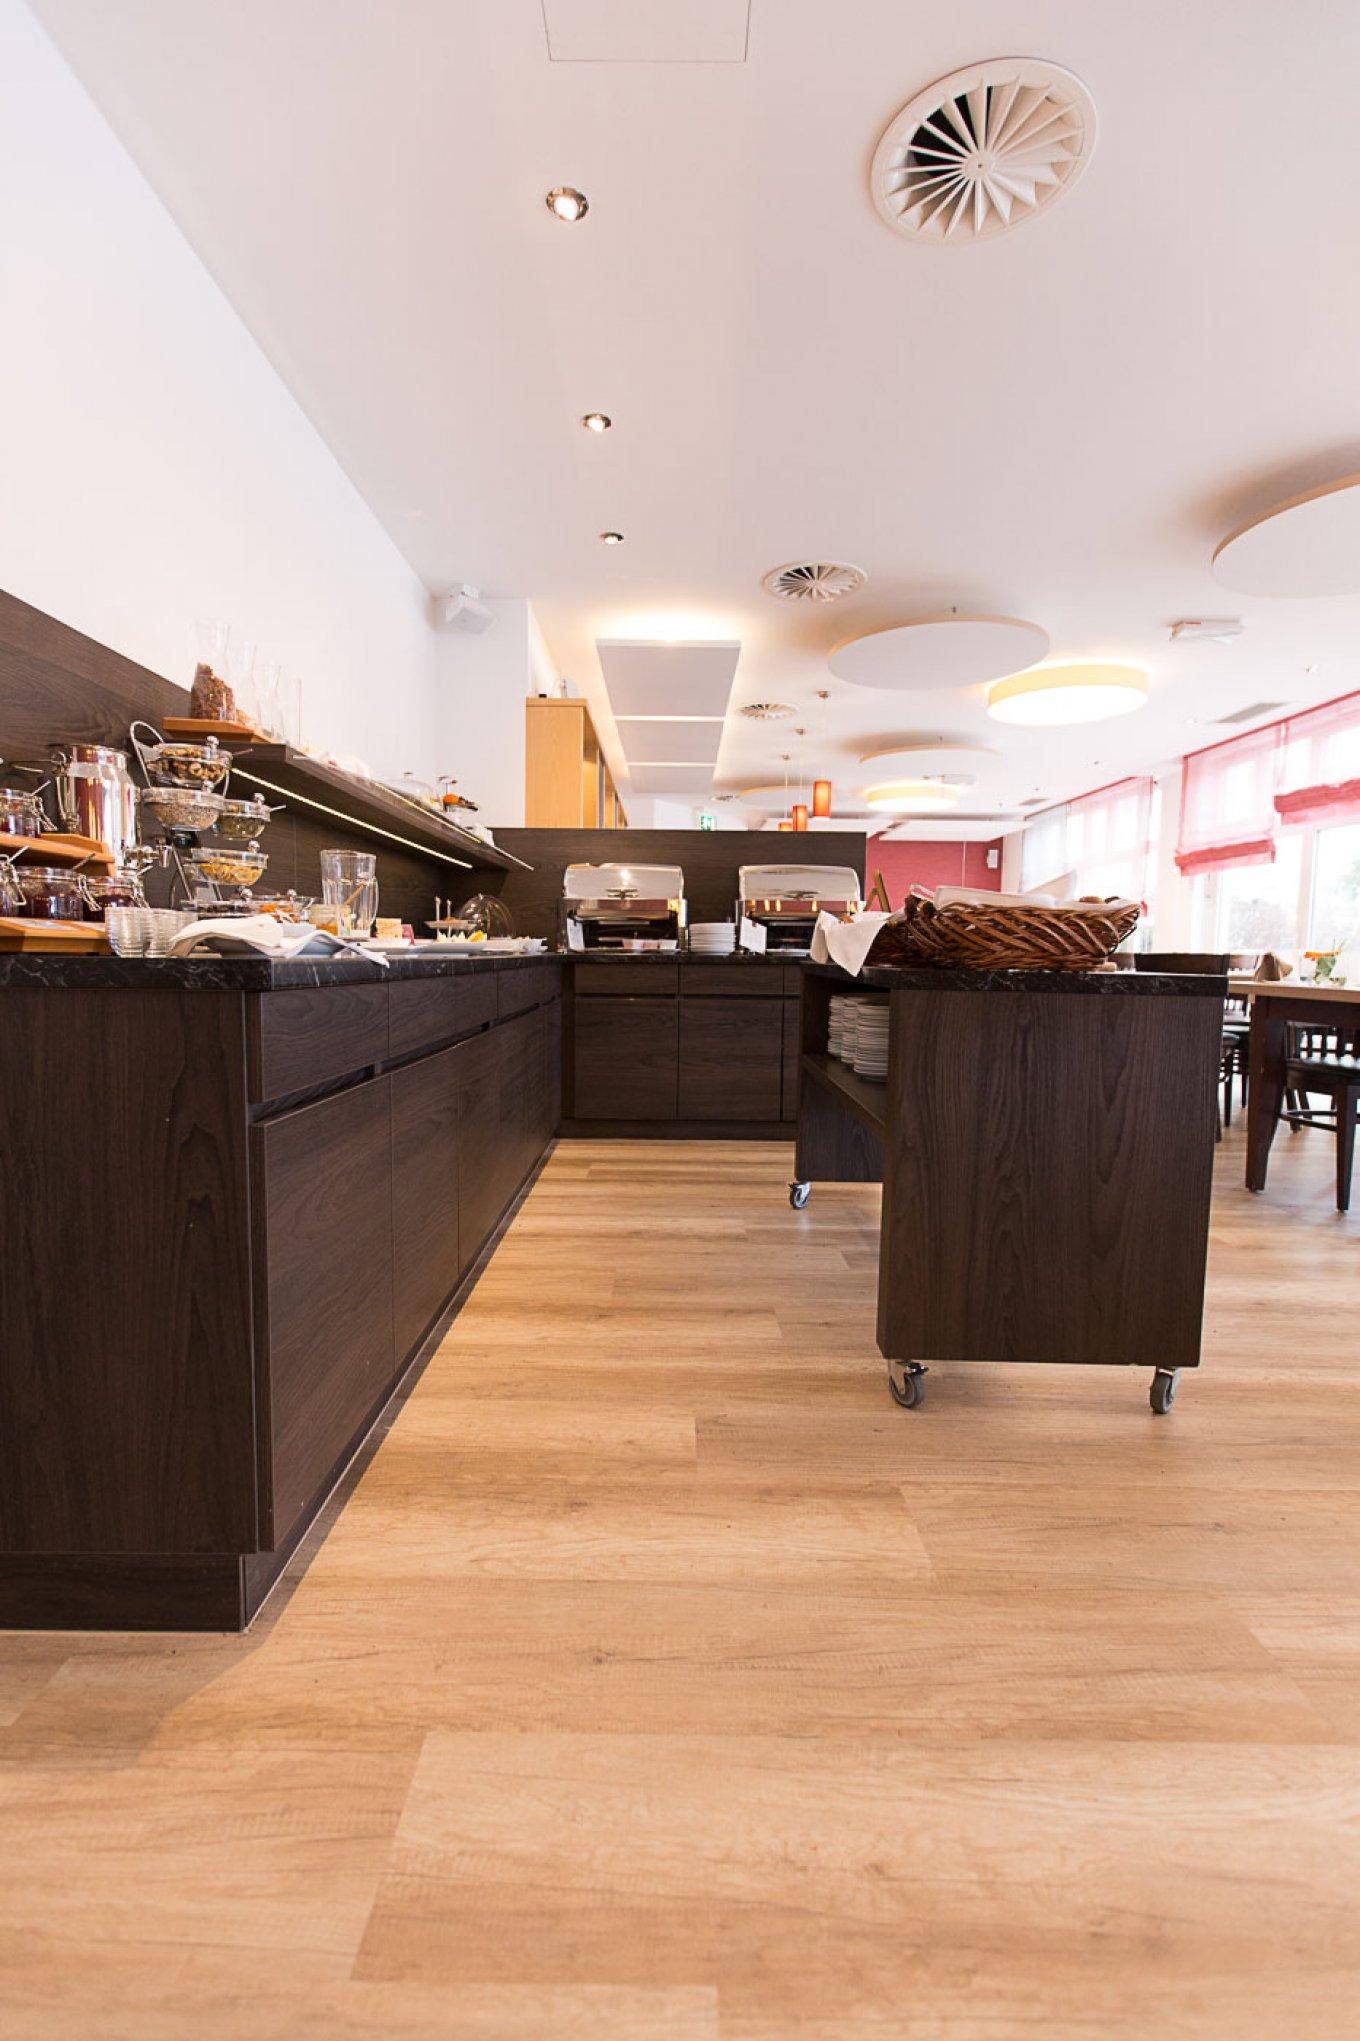 wineo Bodenbelag im Hotel Essbereich Restaurant rustikal Holzoptik Buffet